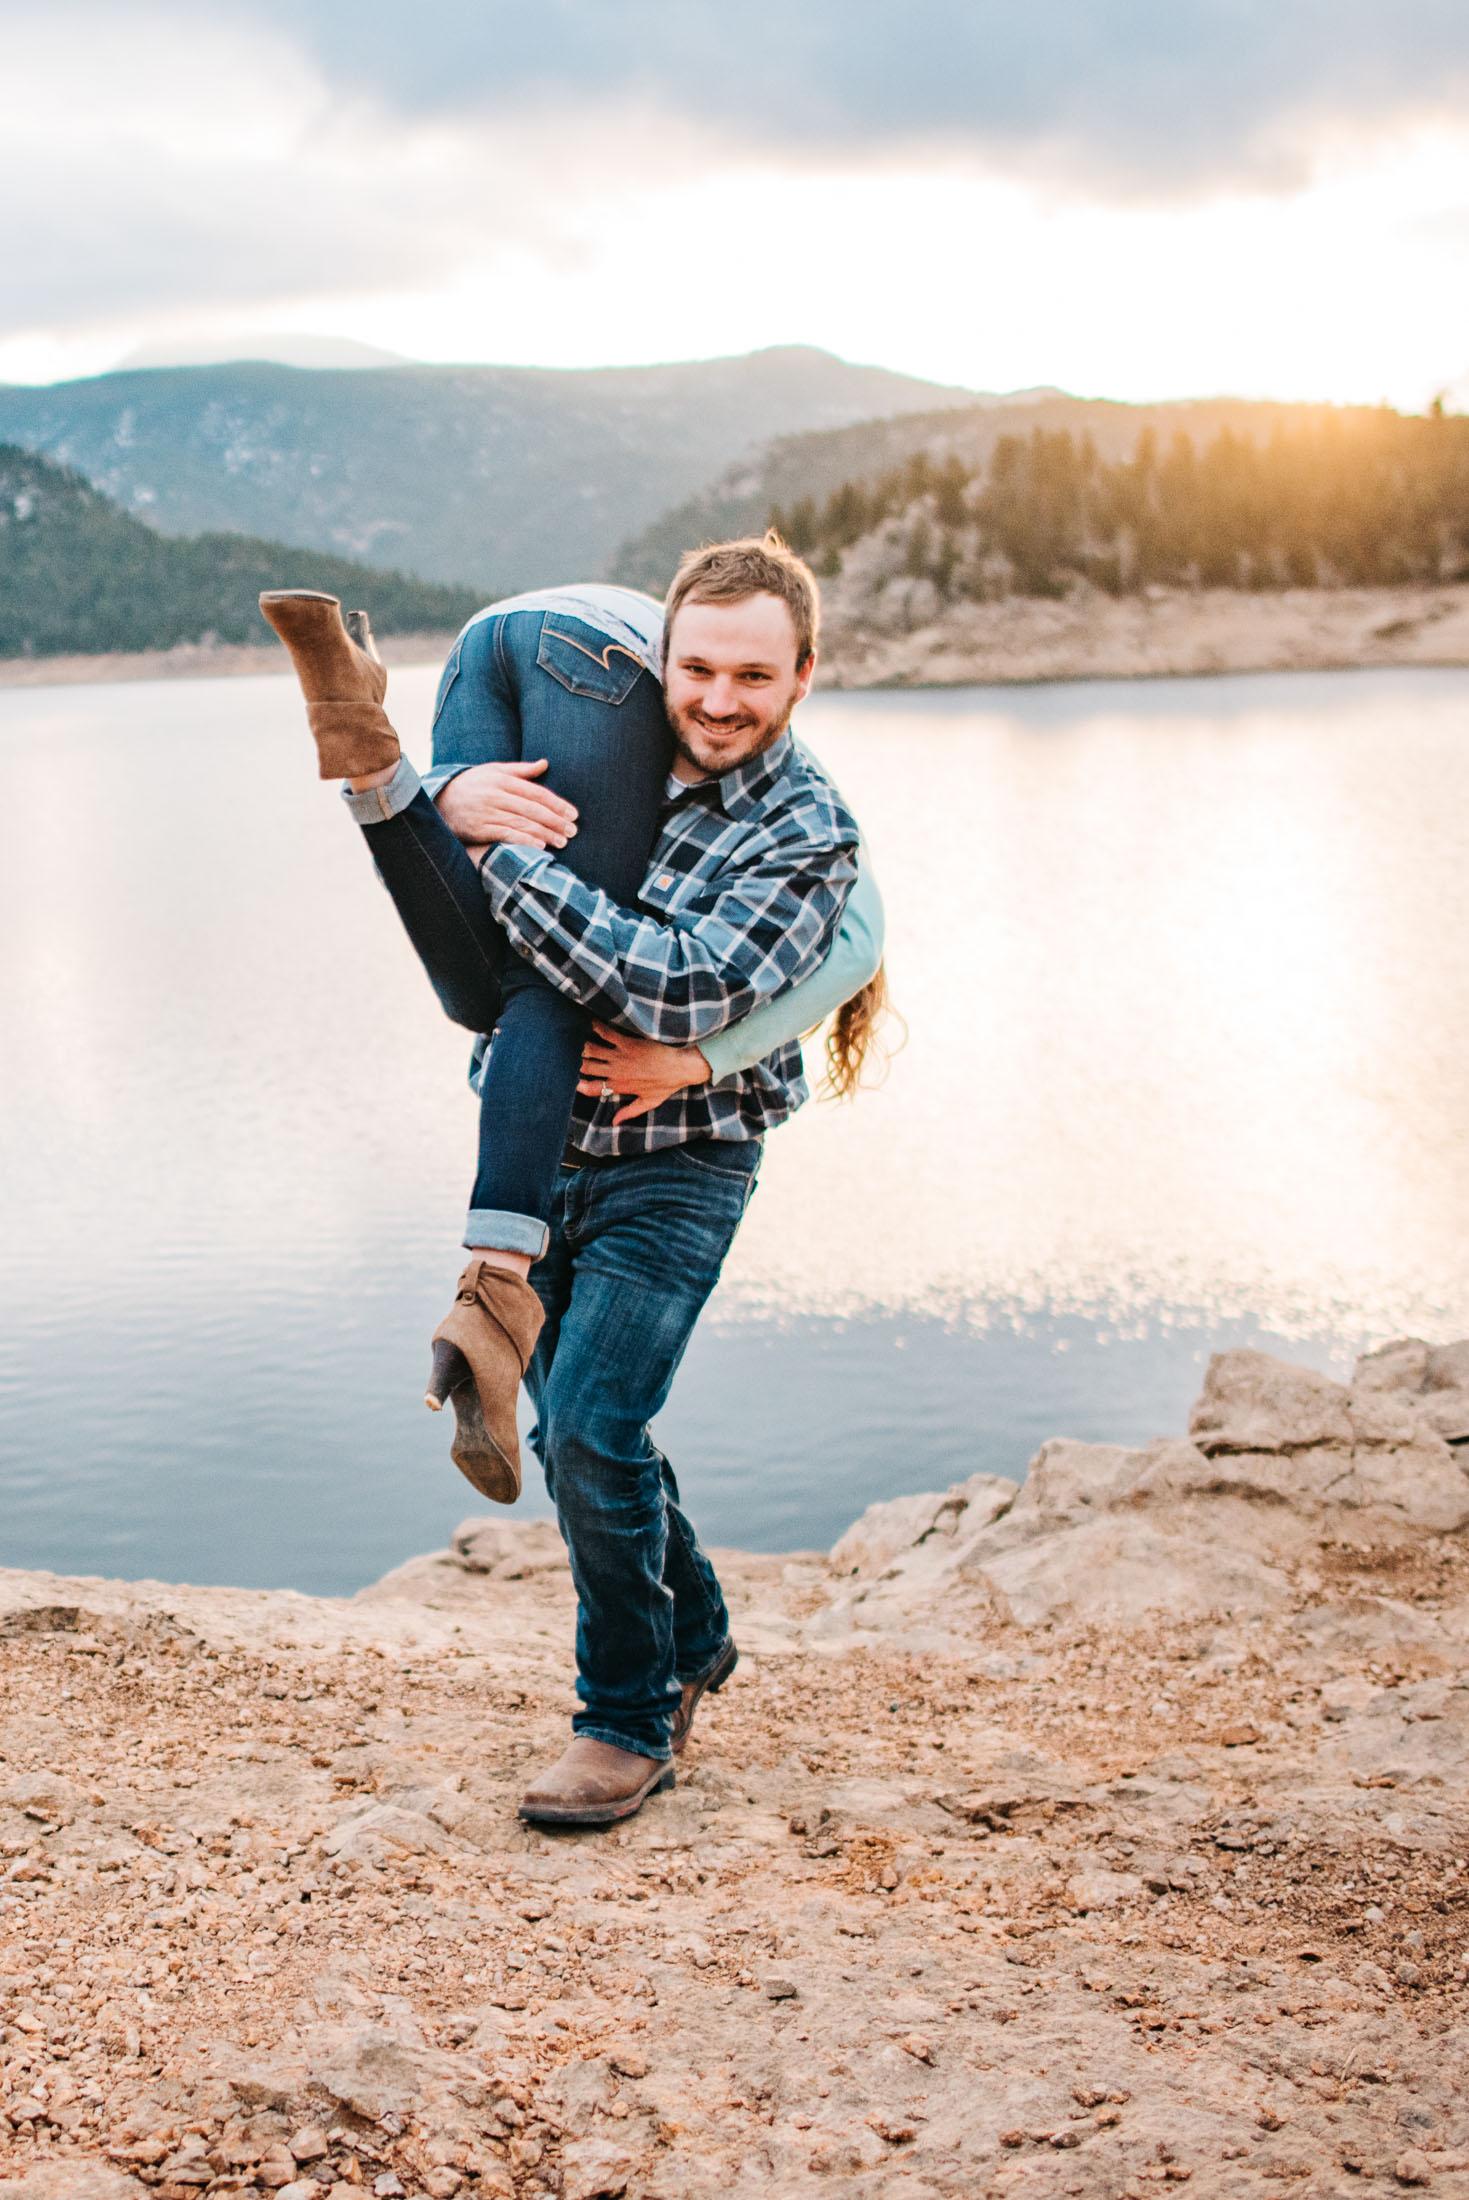 Anniversary Adventure Engagement Couple Photography | Mountain Denver Colorado